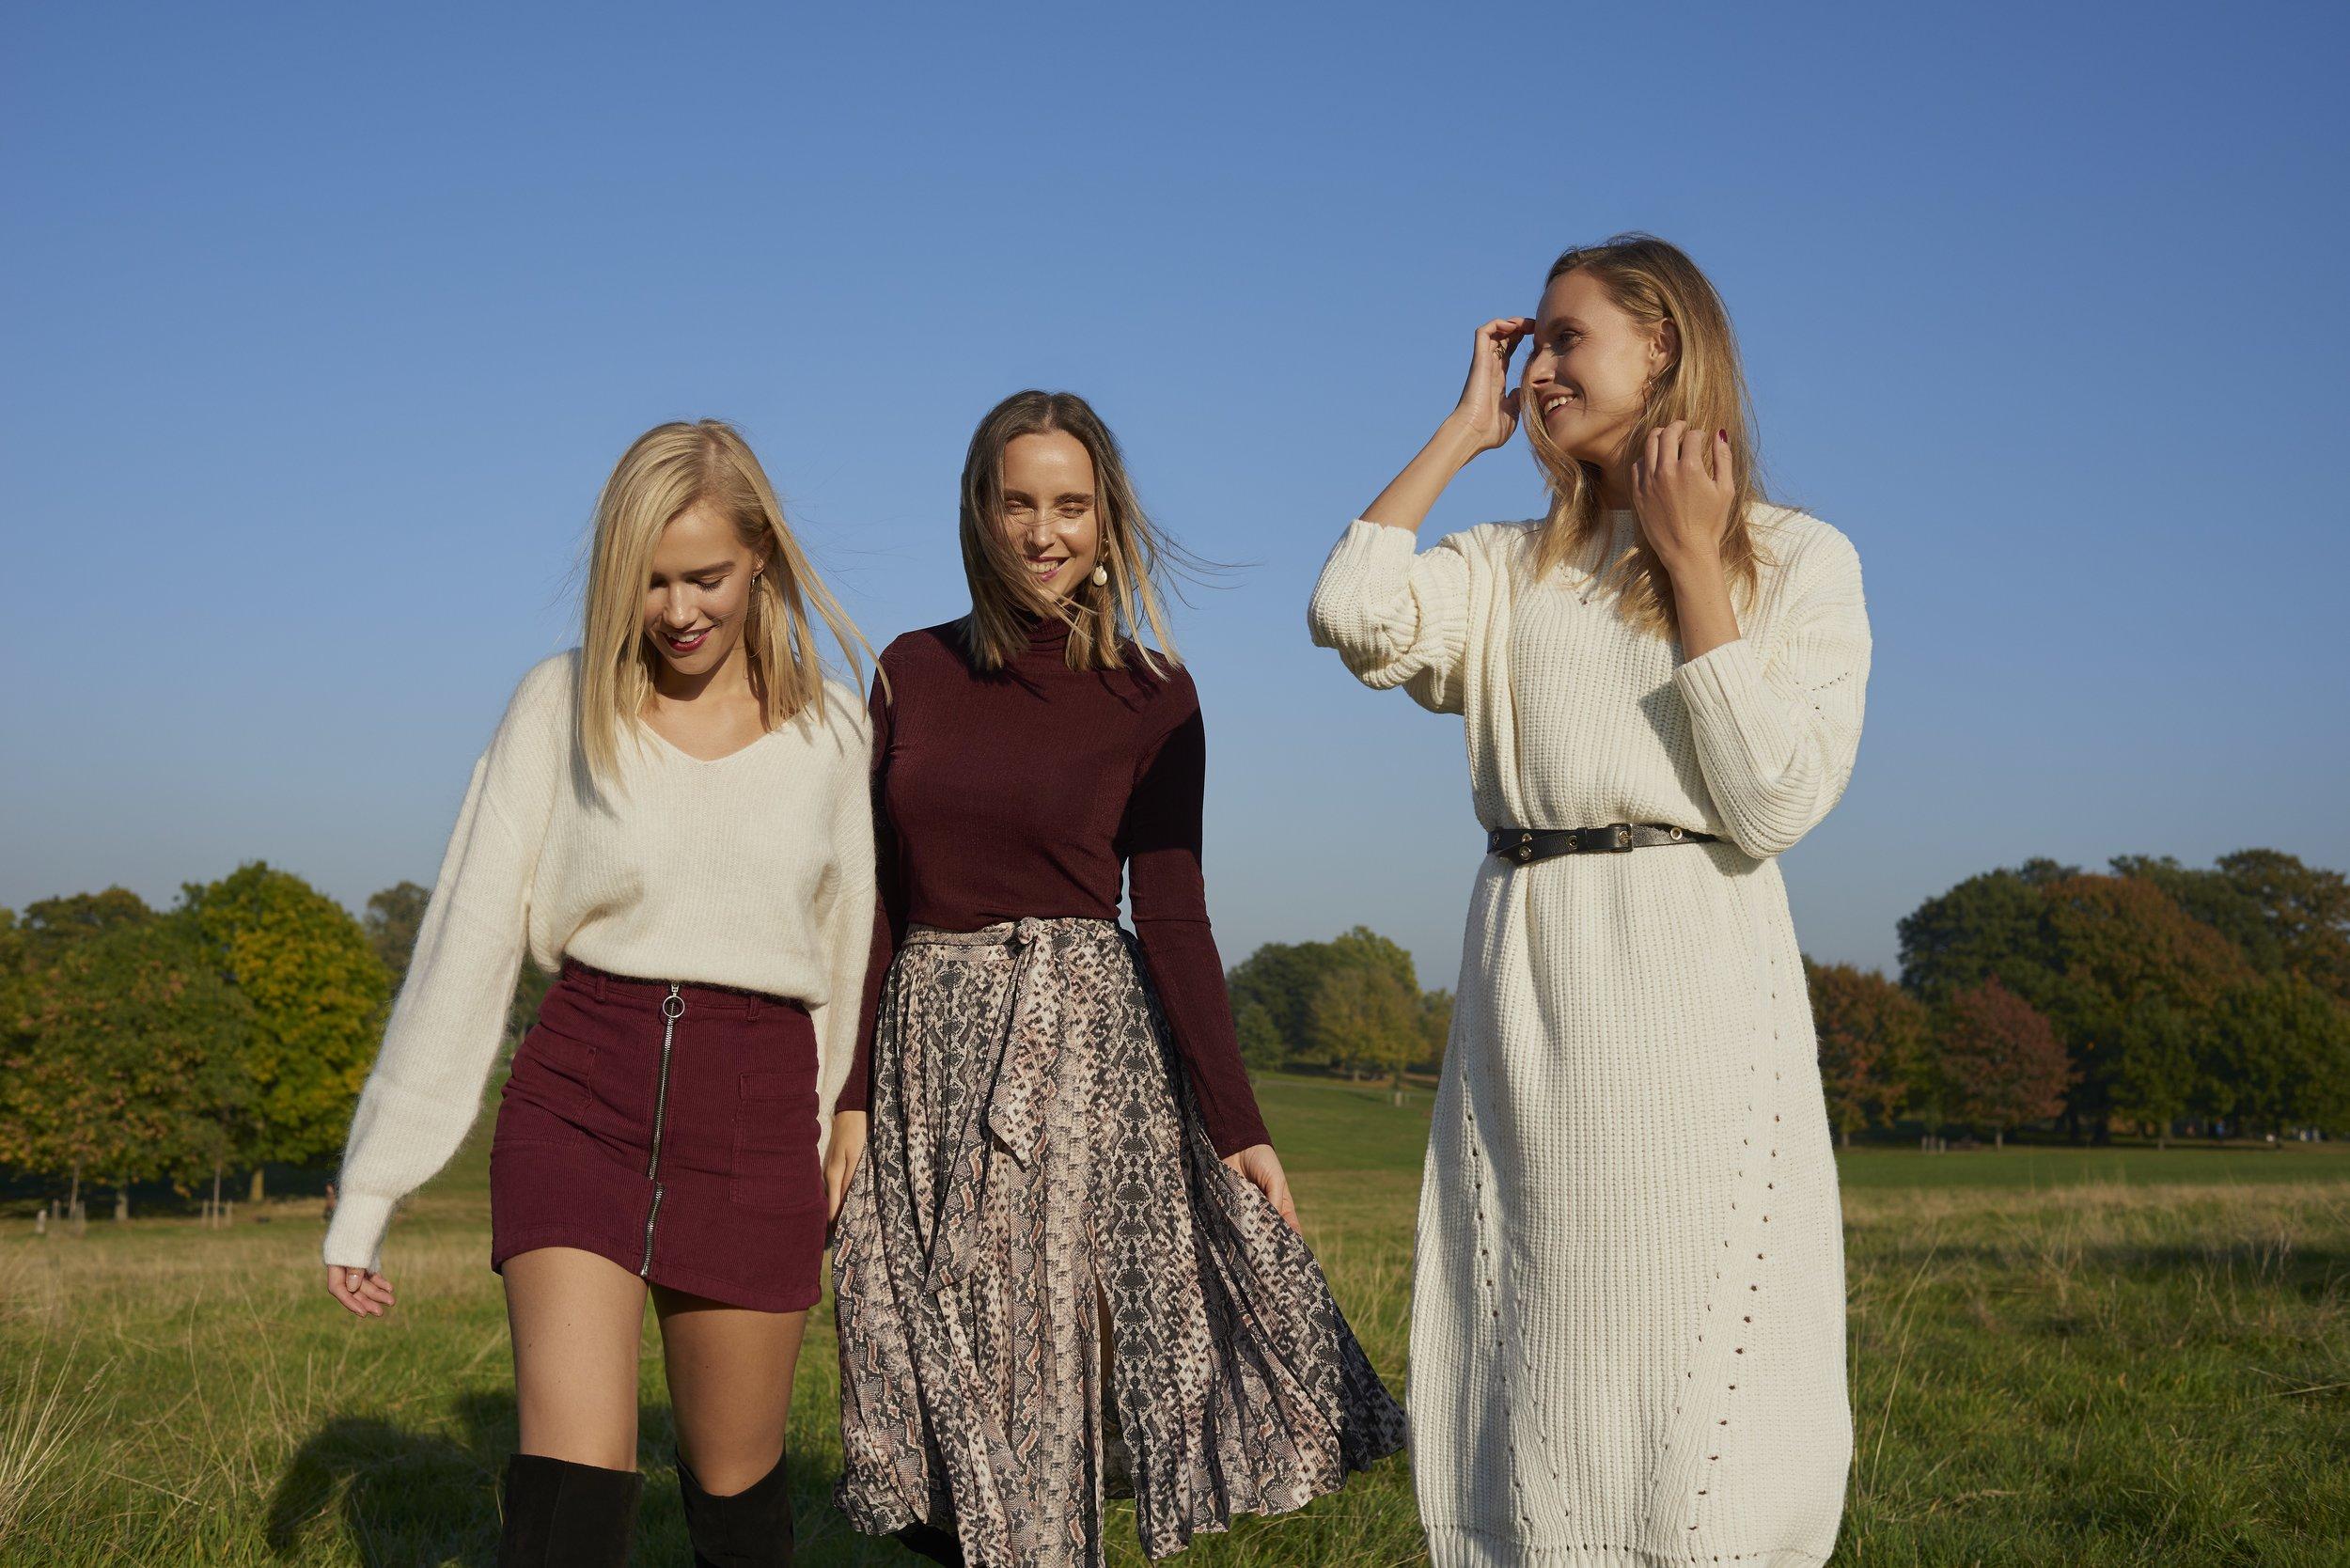 THE 4 OF US - by Eva Schwank